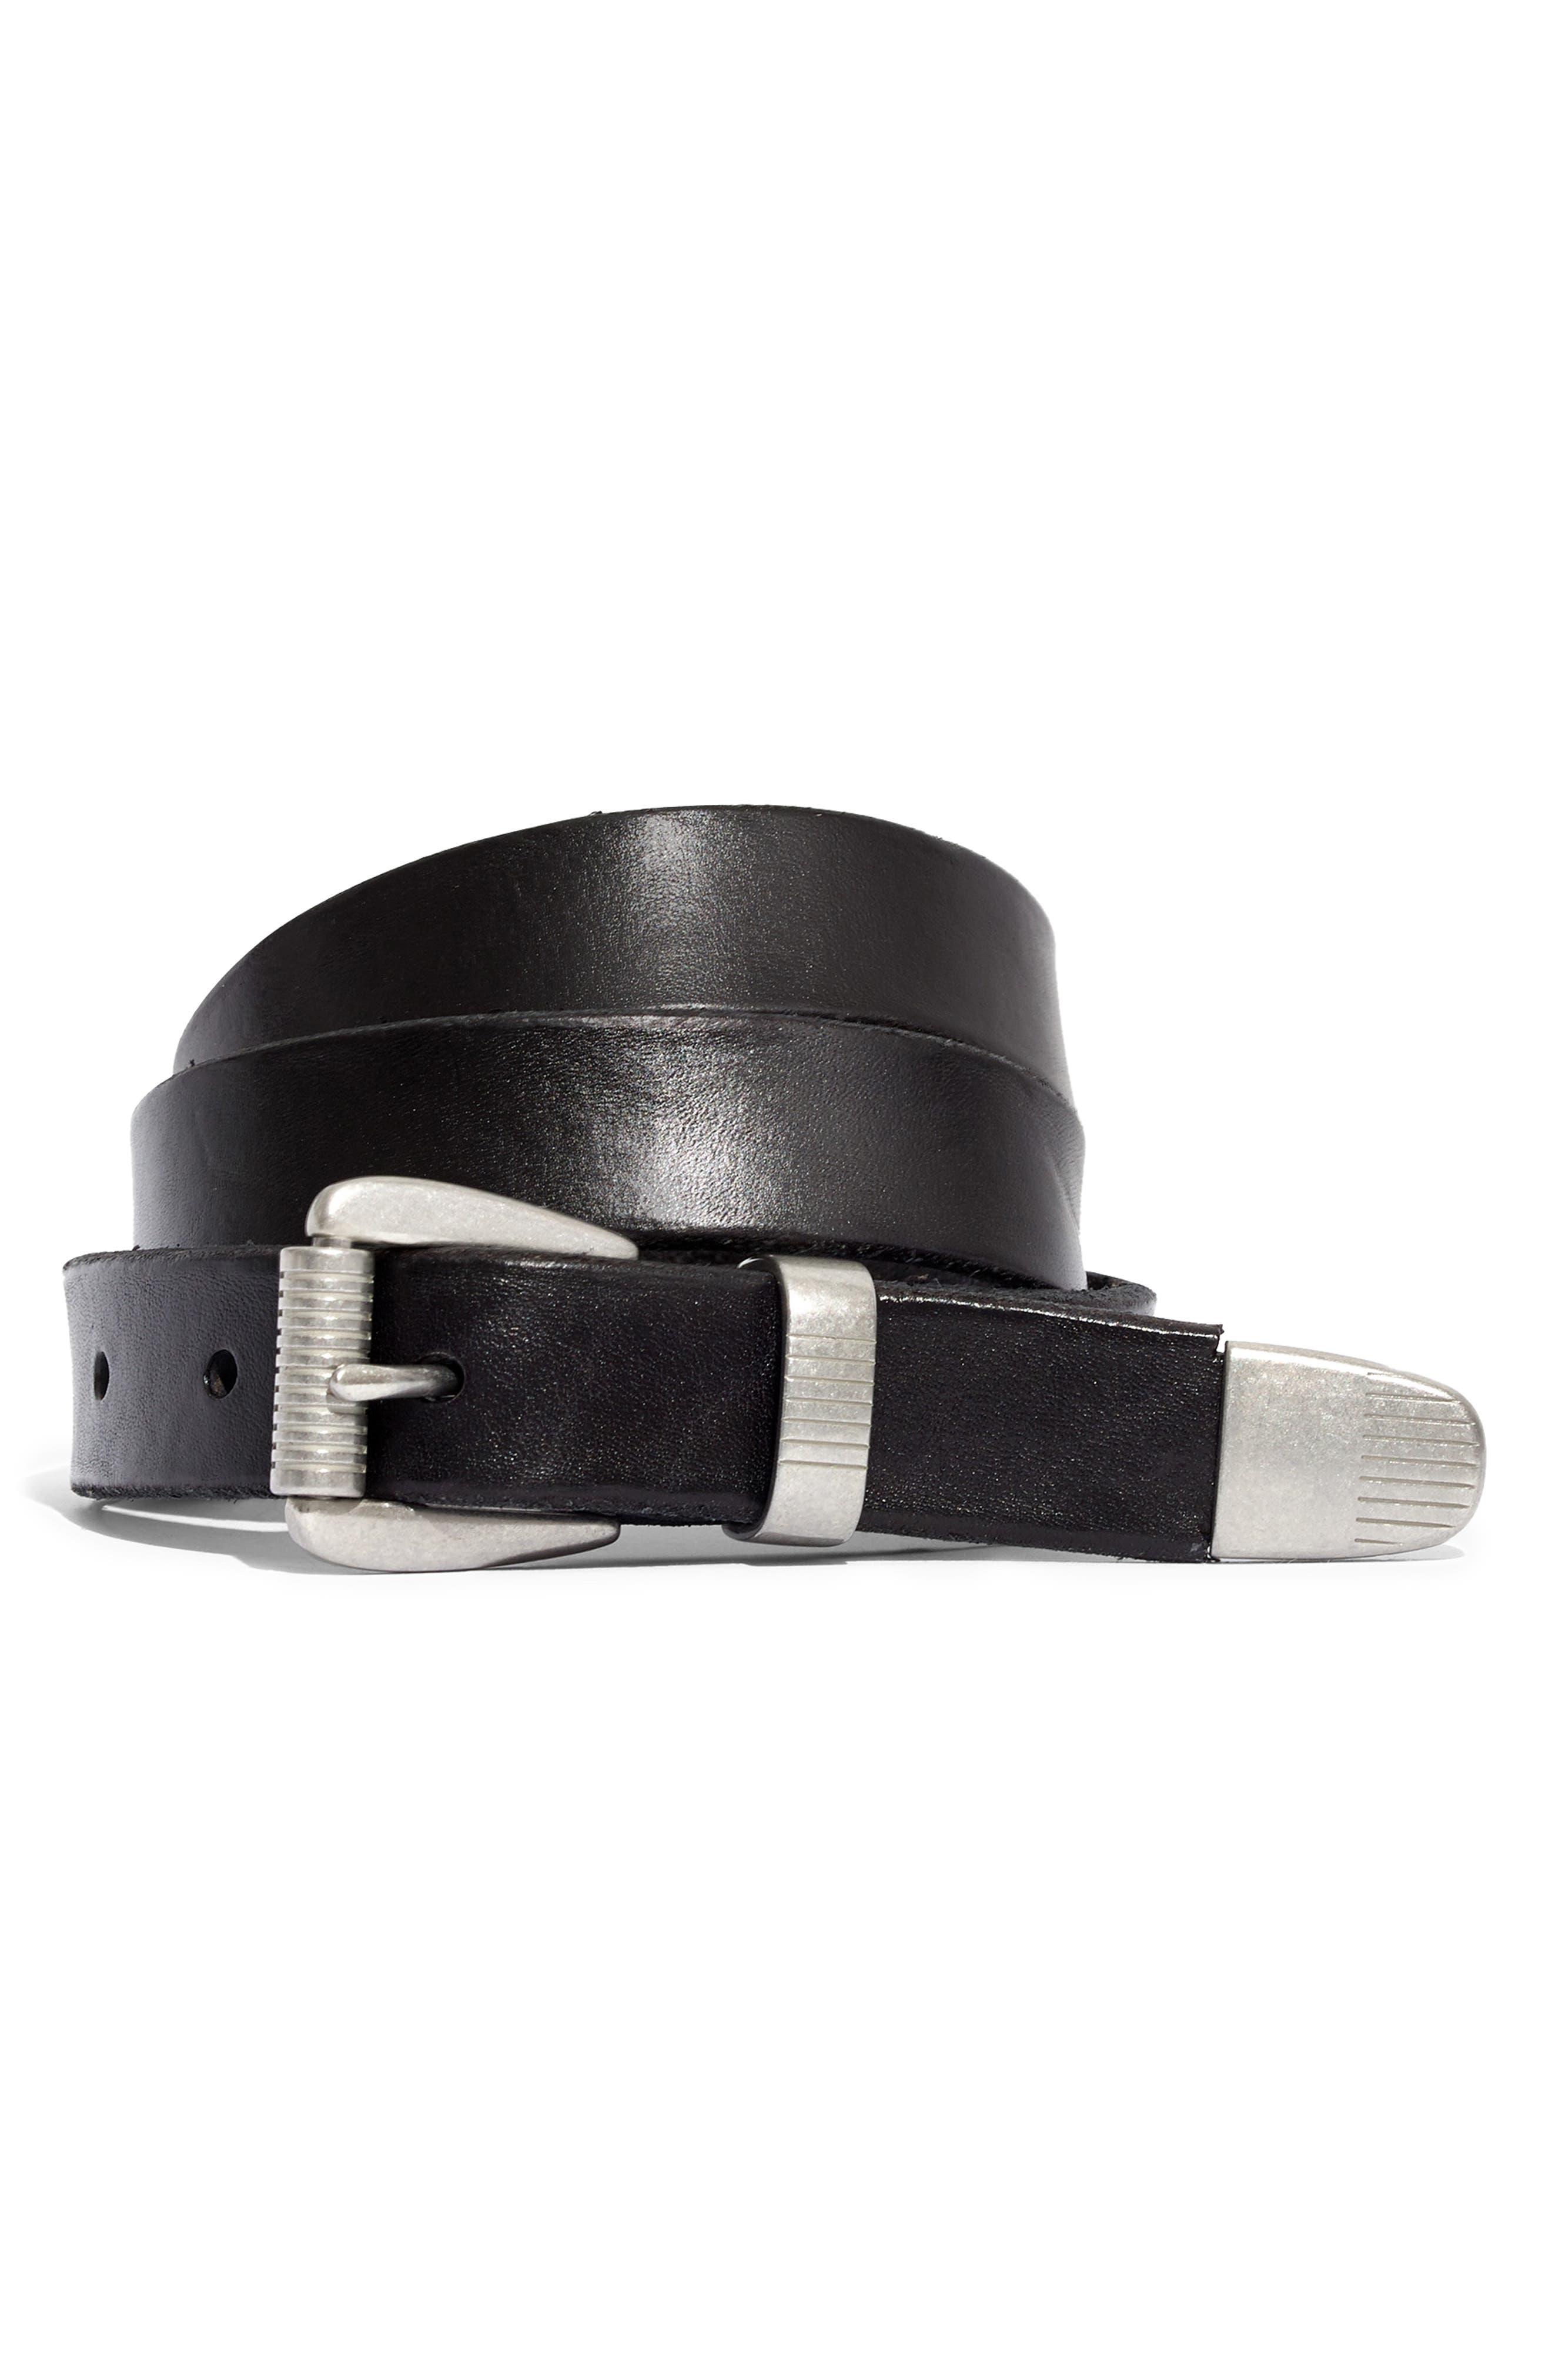 MADEWELL Leather Three-Piece Belt, Main, color, TRUE BLACK